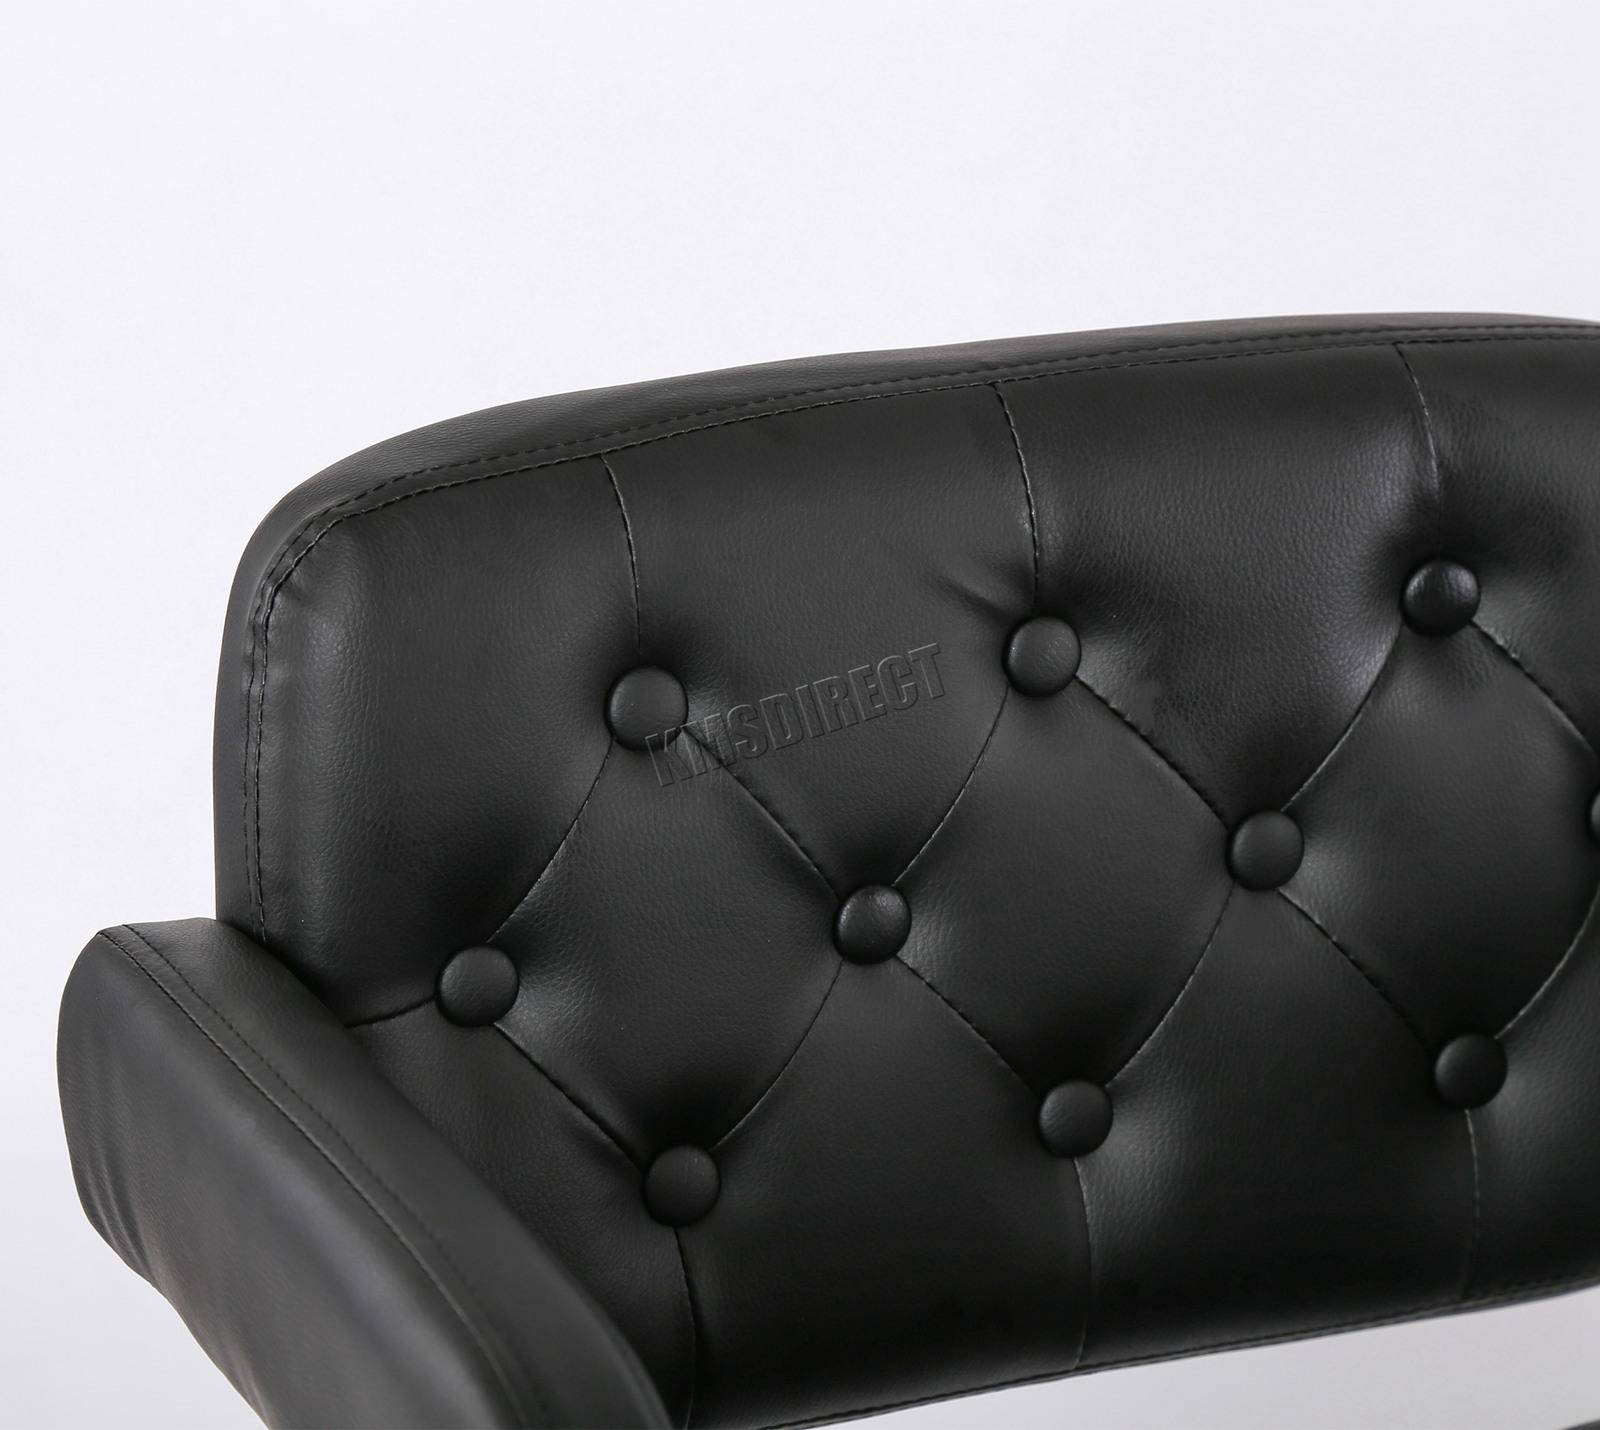 WestWood-Beauty-Salon-Chair-Barber-Hairdressing-Hair-Cut-PU-Leather-Modern-SC02 miniatuur 18